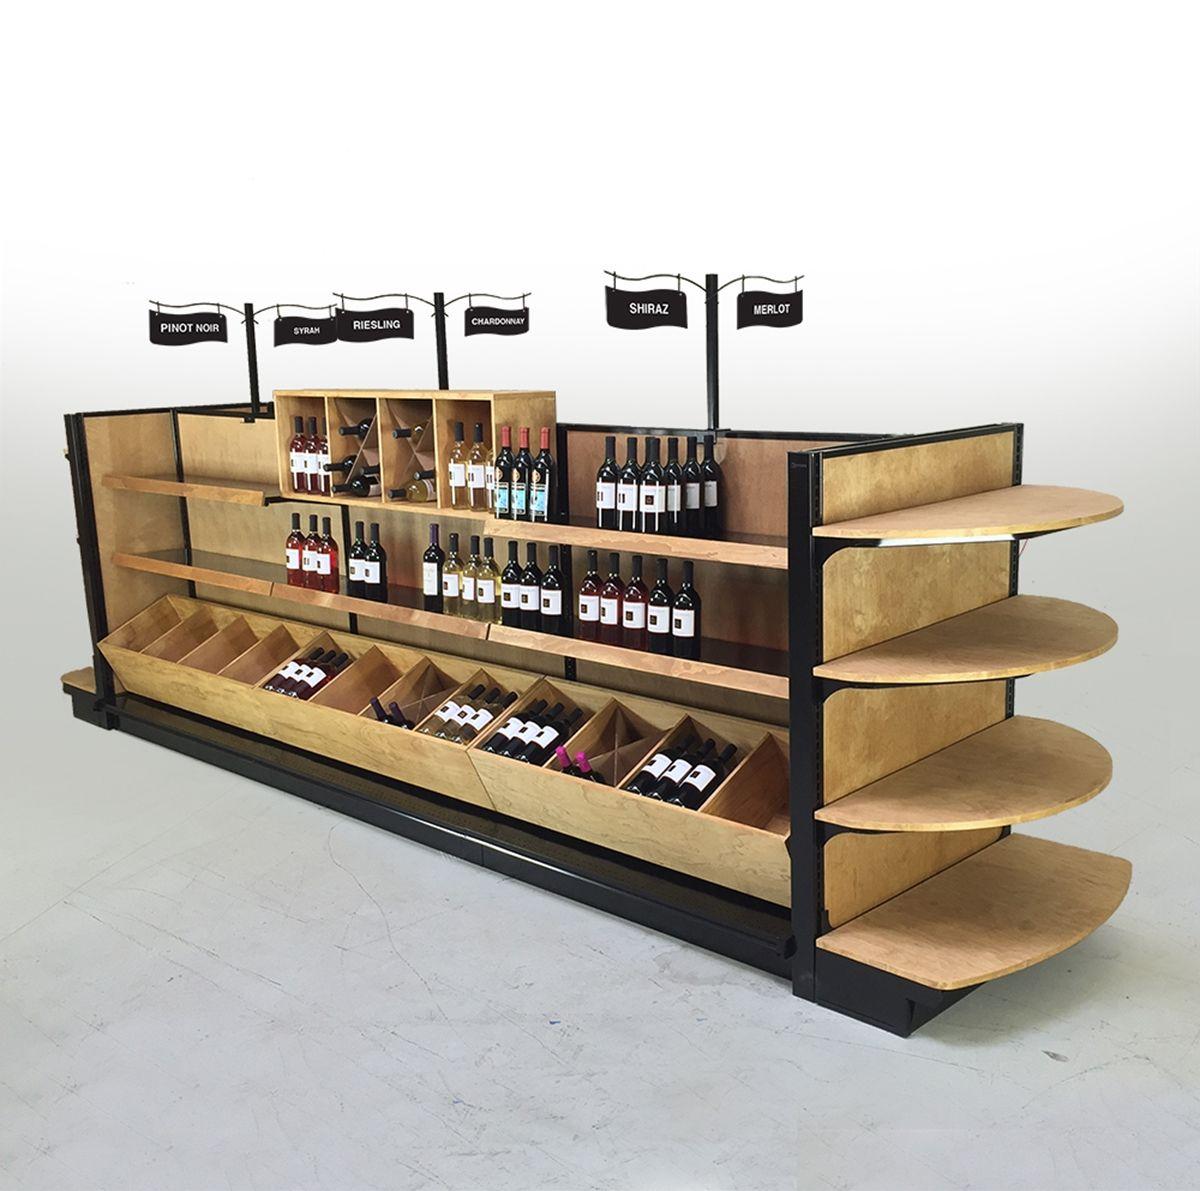 Commercial Wine Racks Liquor Shelves Beer Displays For